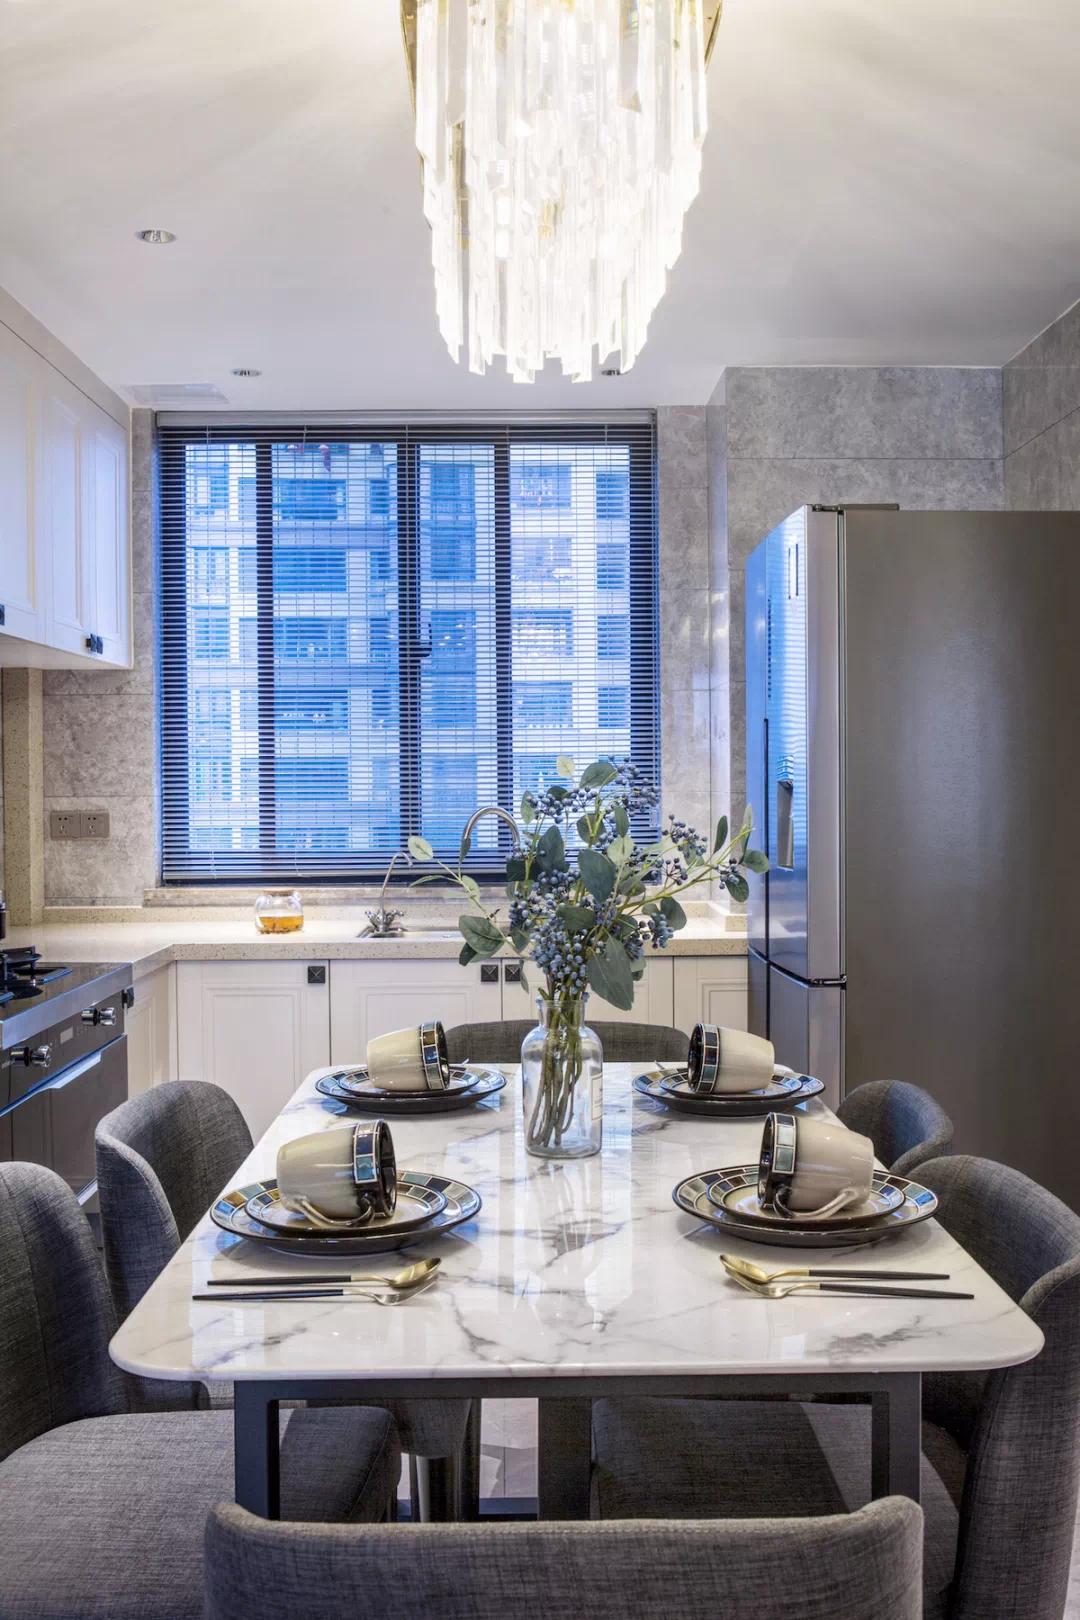 110m²舒适的现代风格,让家人舒适,让自己舒适 现代风格 装修 设计 第10张